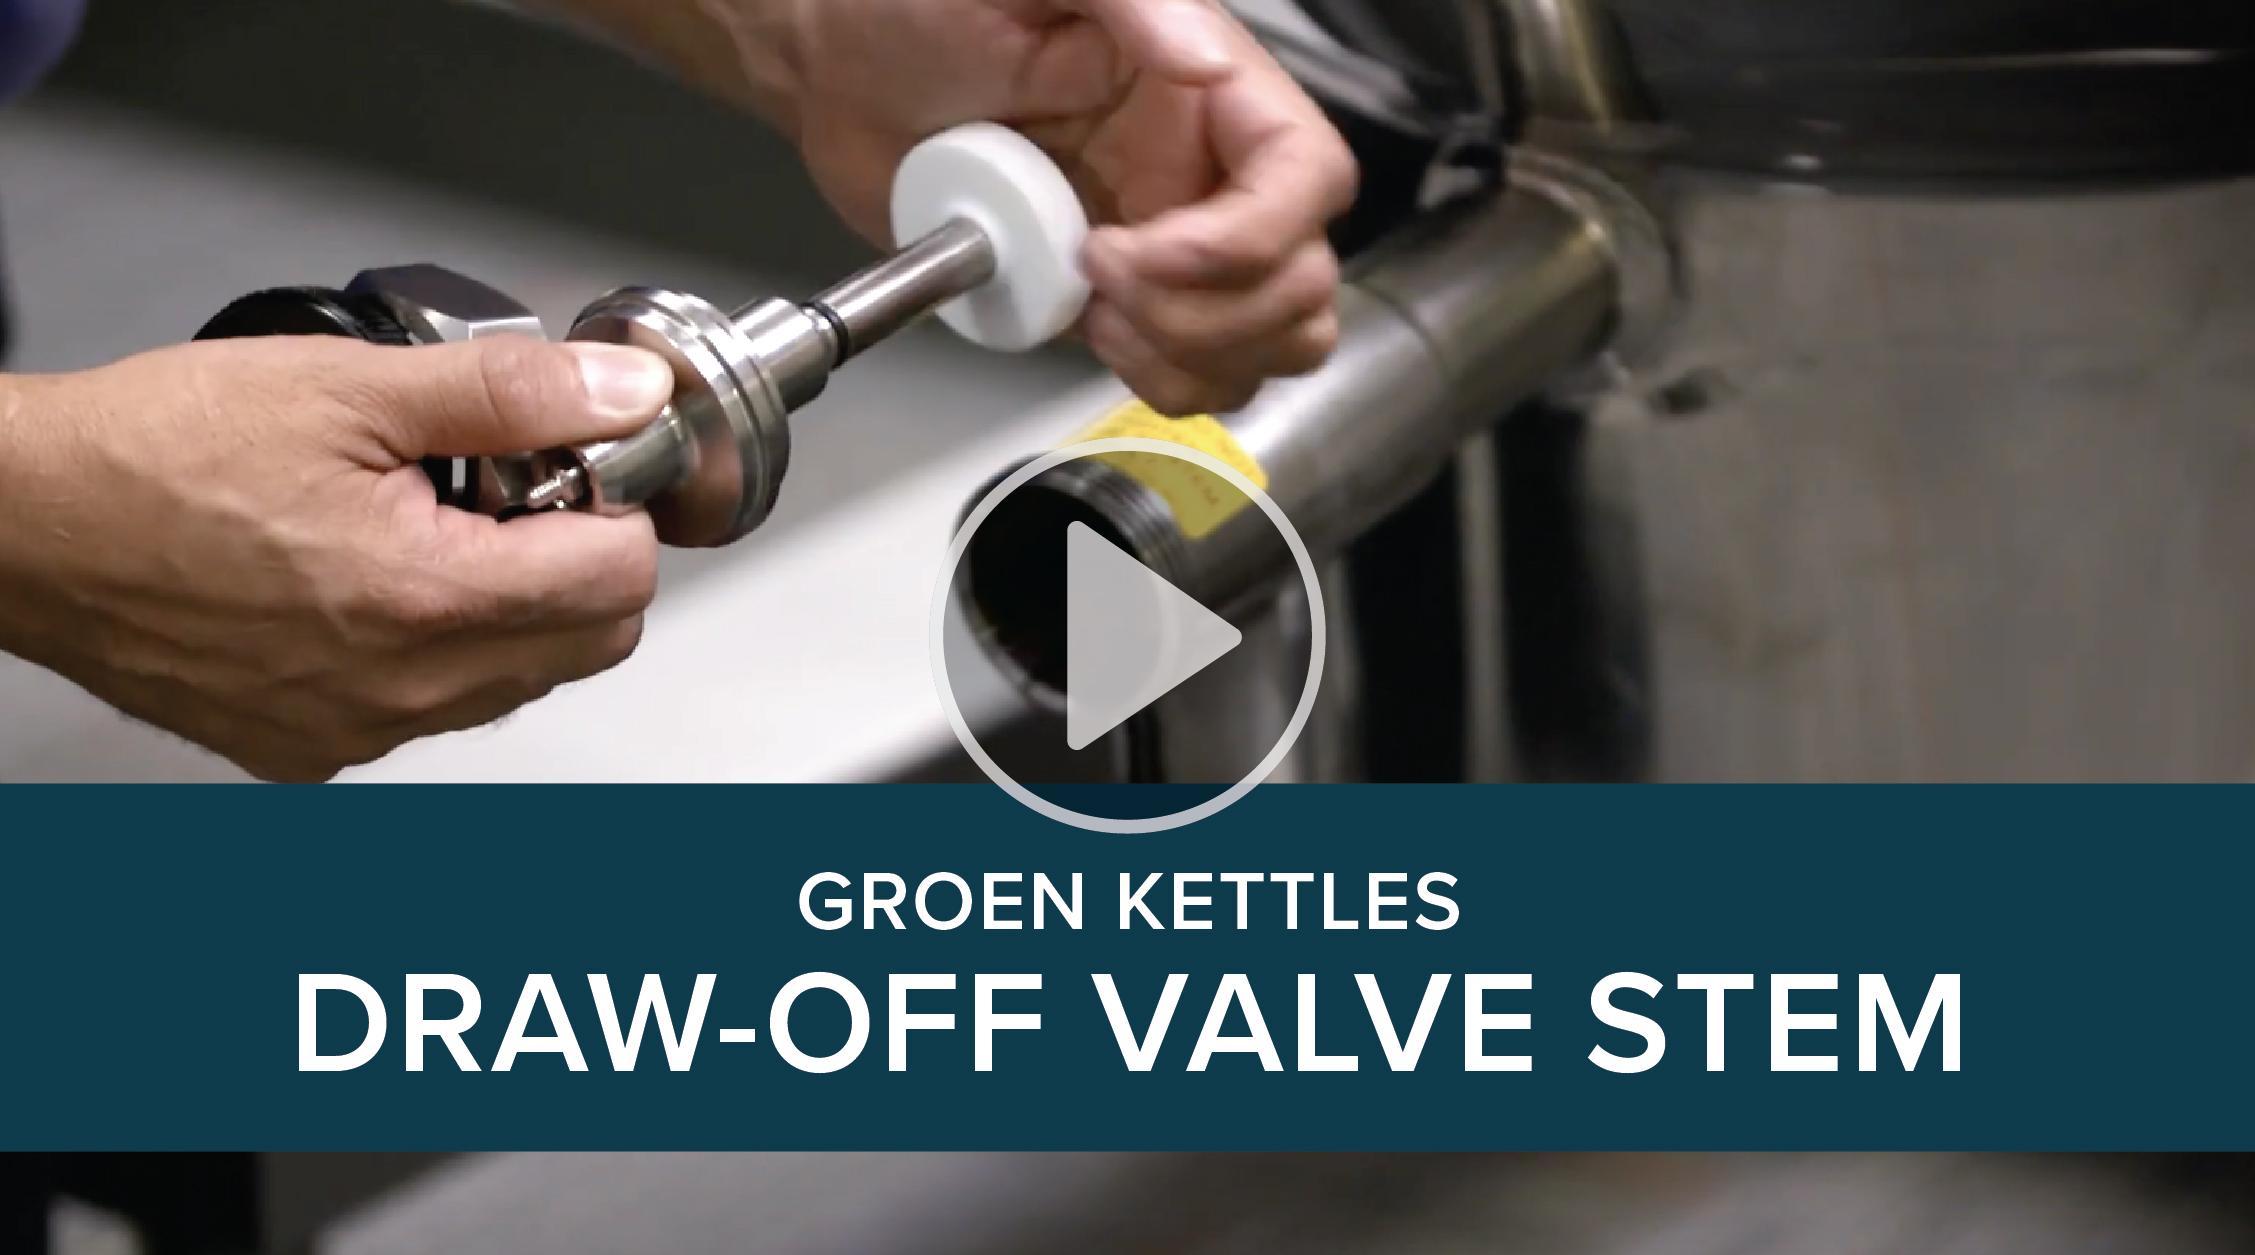 Groen Kettles Draw-off Valve